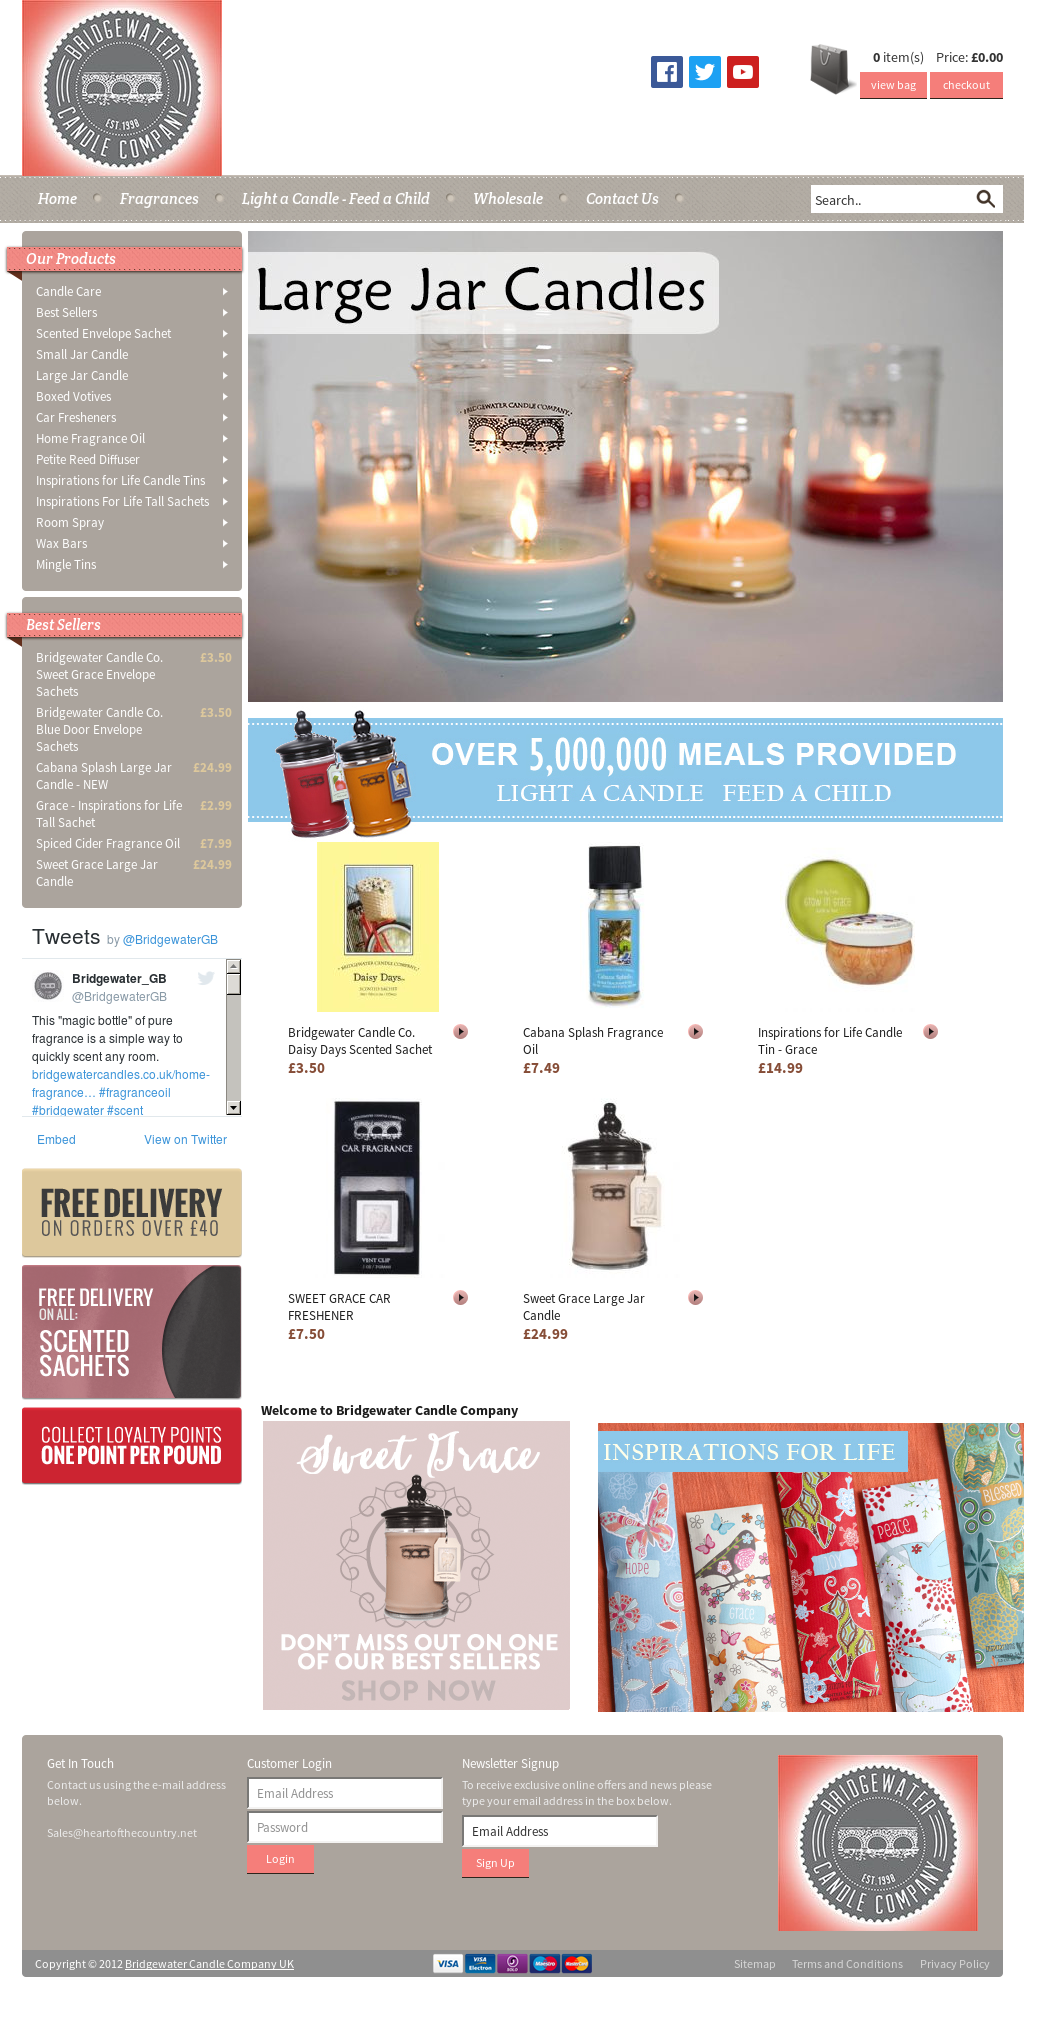 Bridgewater Candle Company Uk Competitors, Revenue and